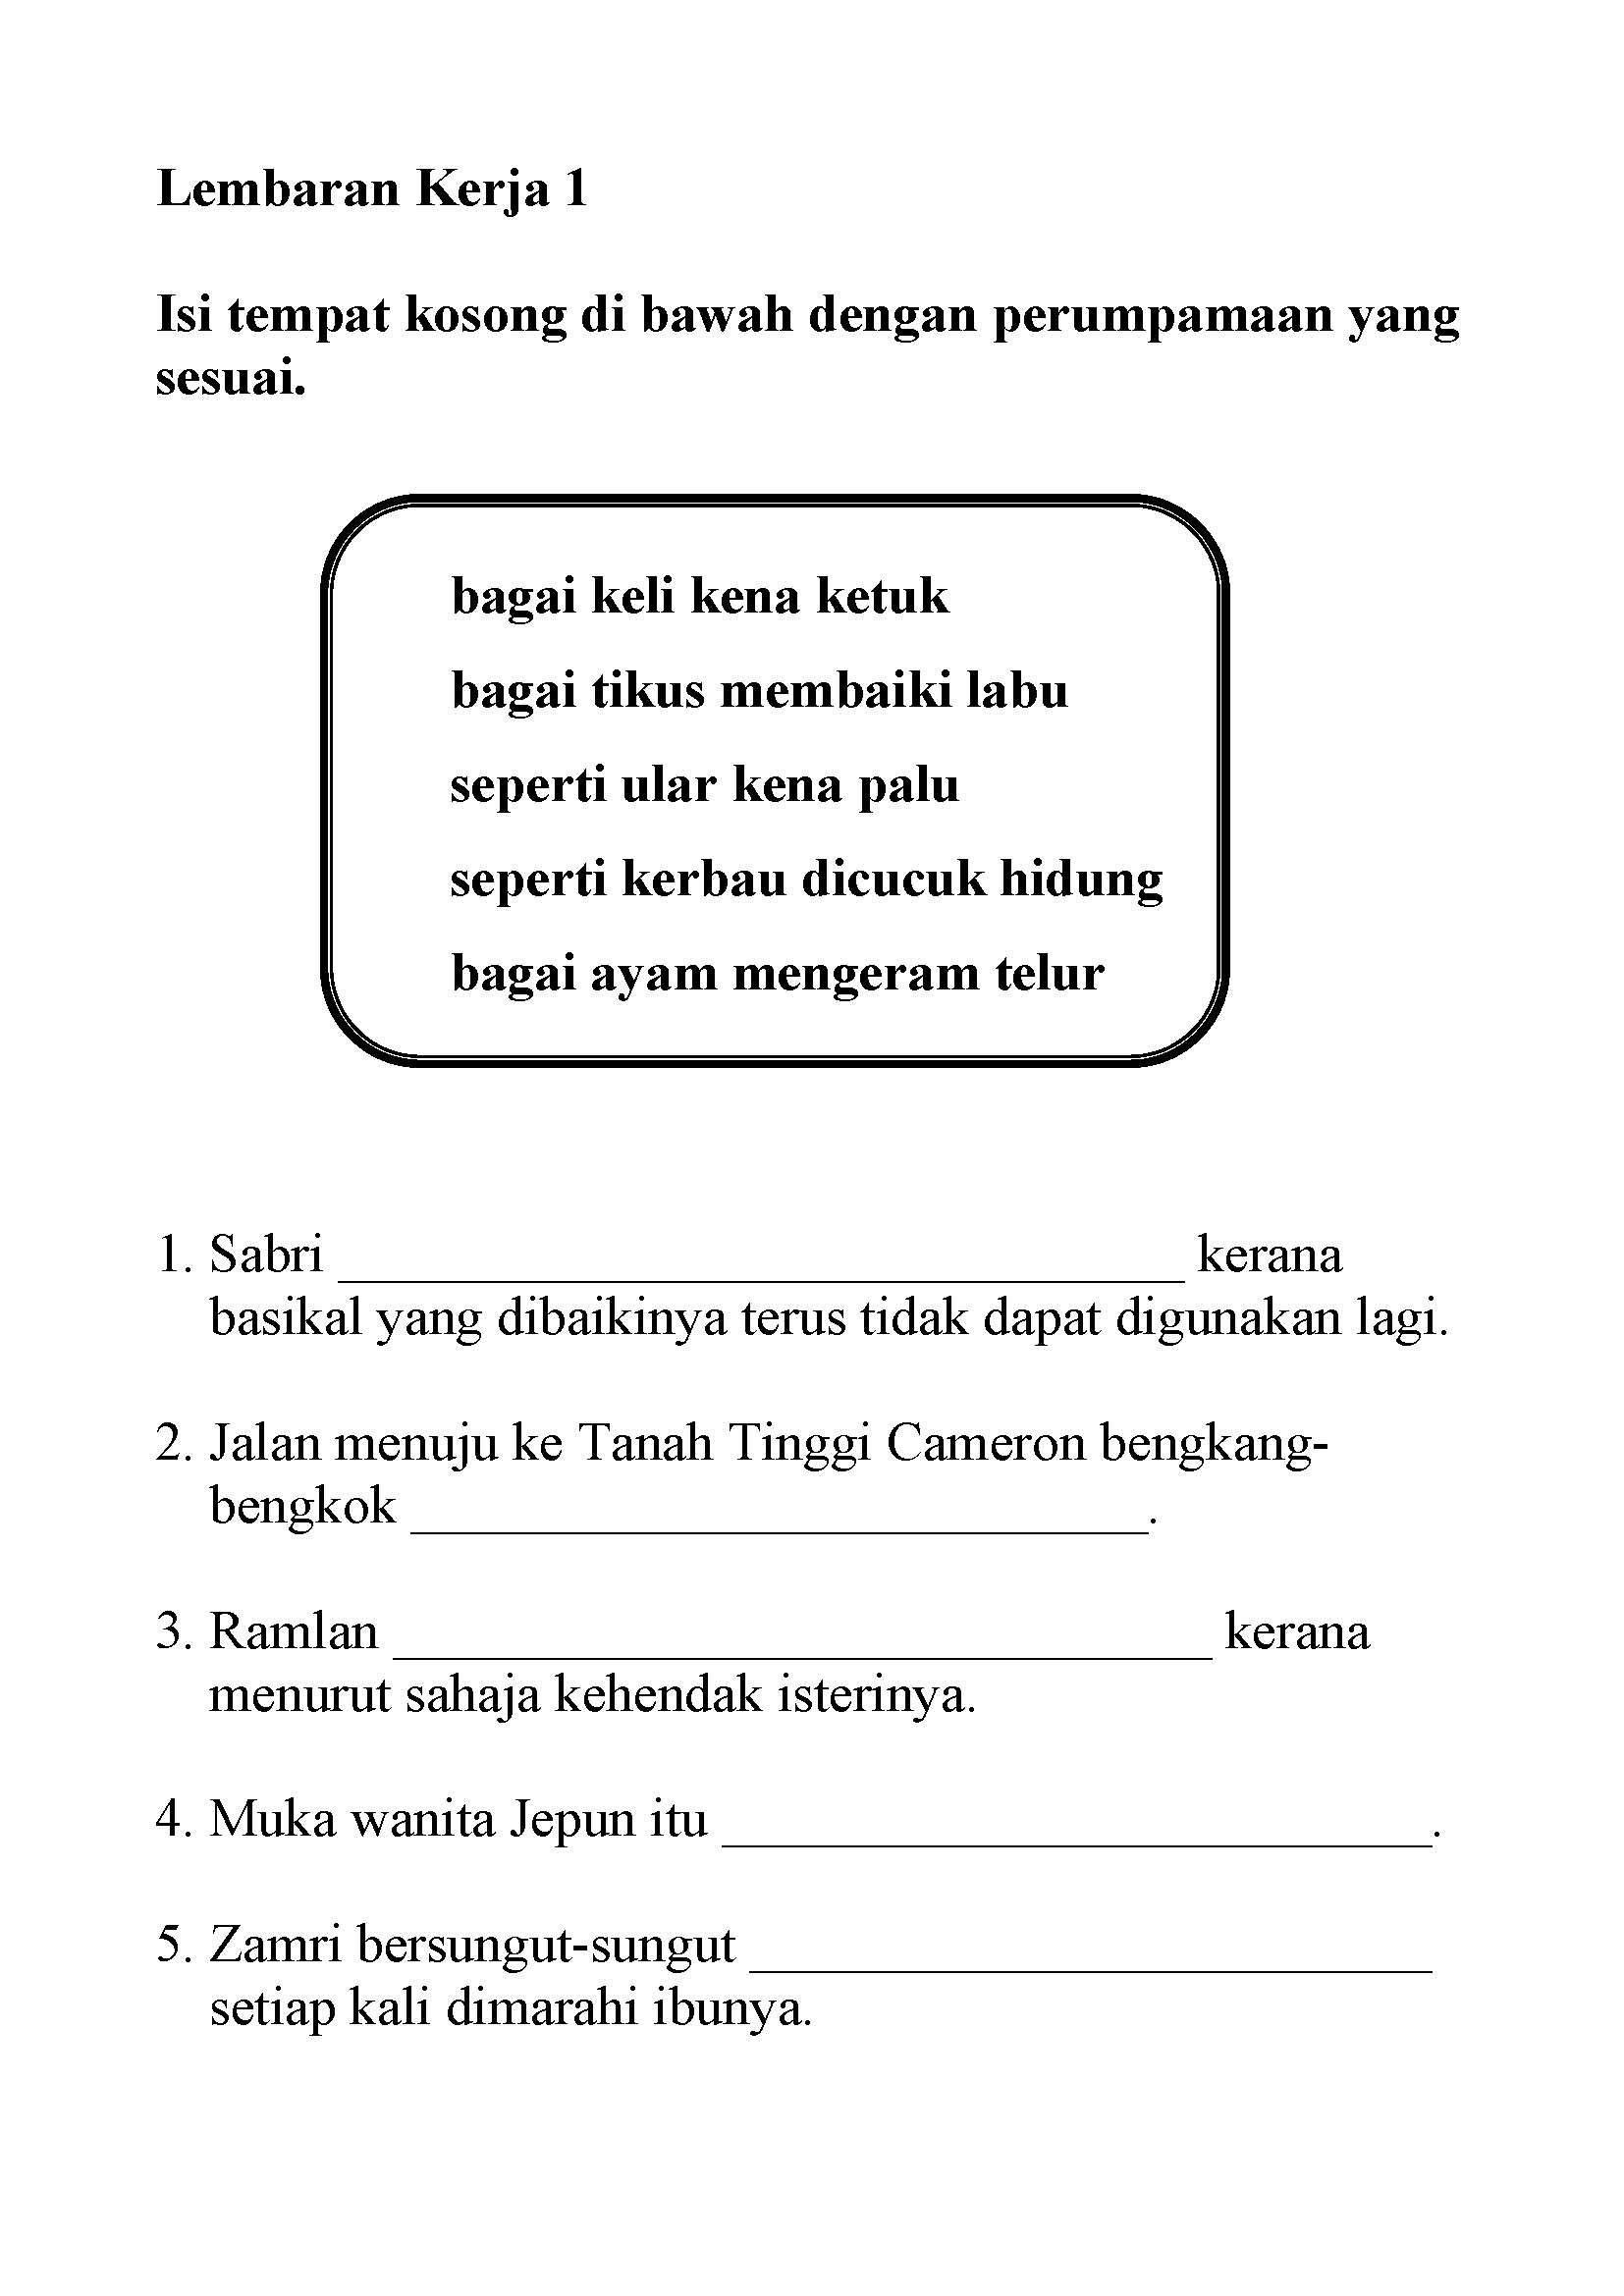 Year 1 Malay Tata Bahasa Worksheet Printable Worksheets And Activities For Teachers Parents Tutors And Homeschool Families